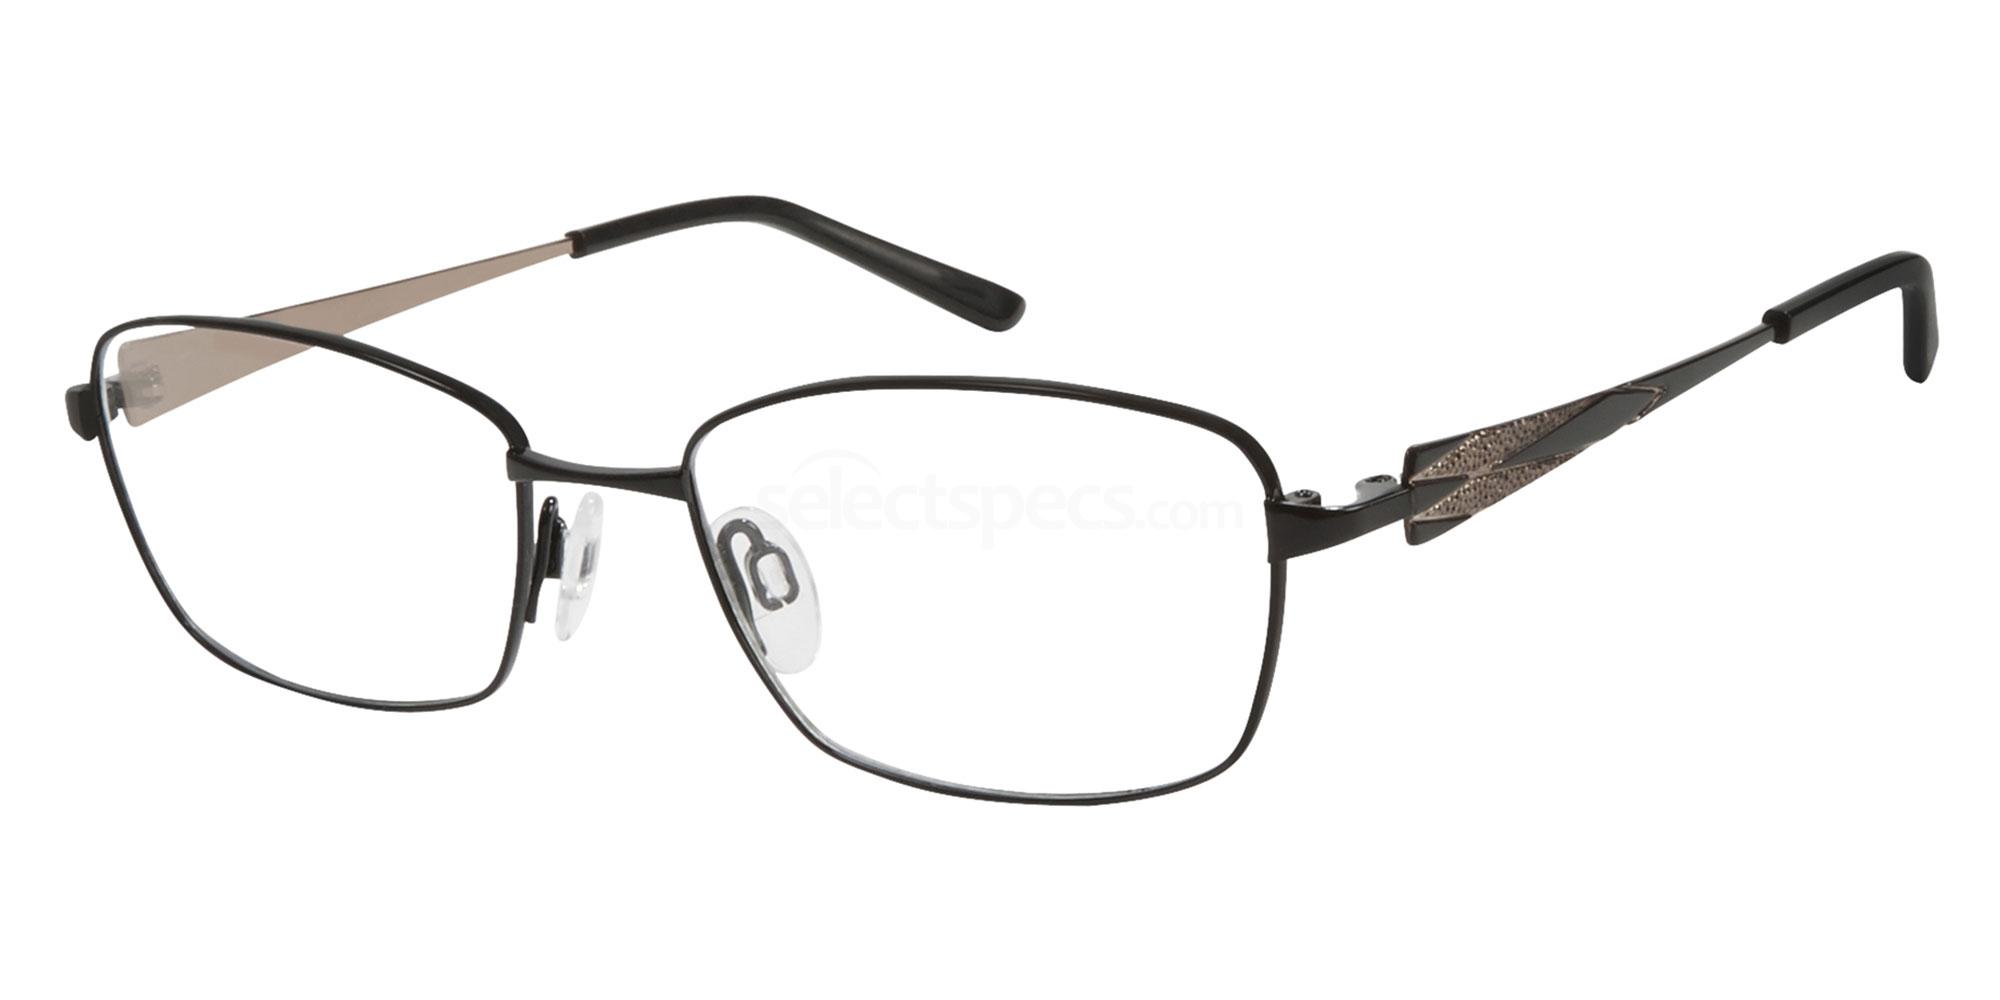 BK CH12139 Glasses, Charmant Titanium Perfection